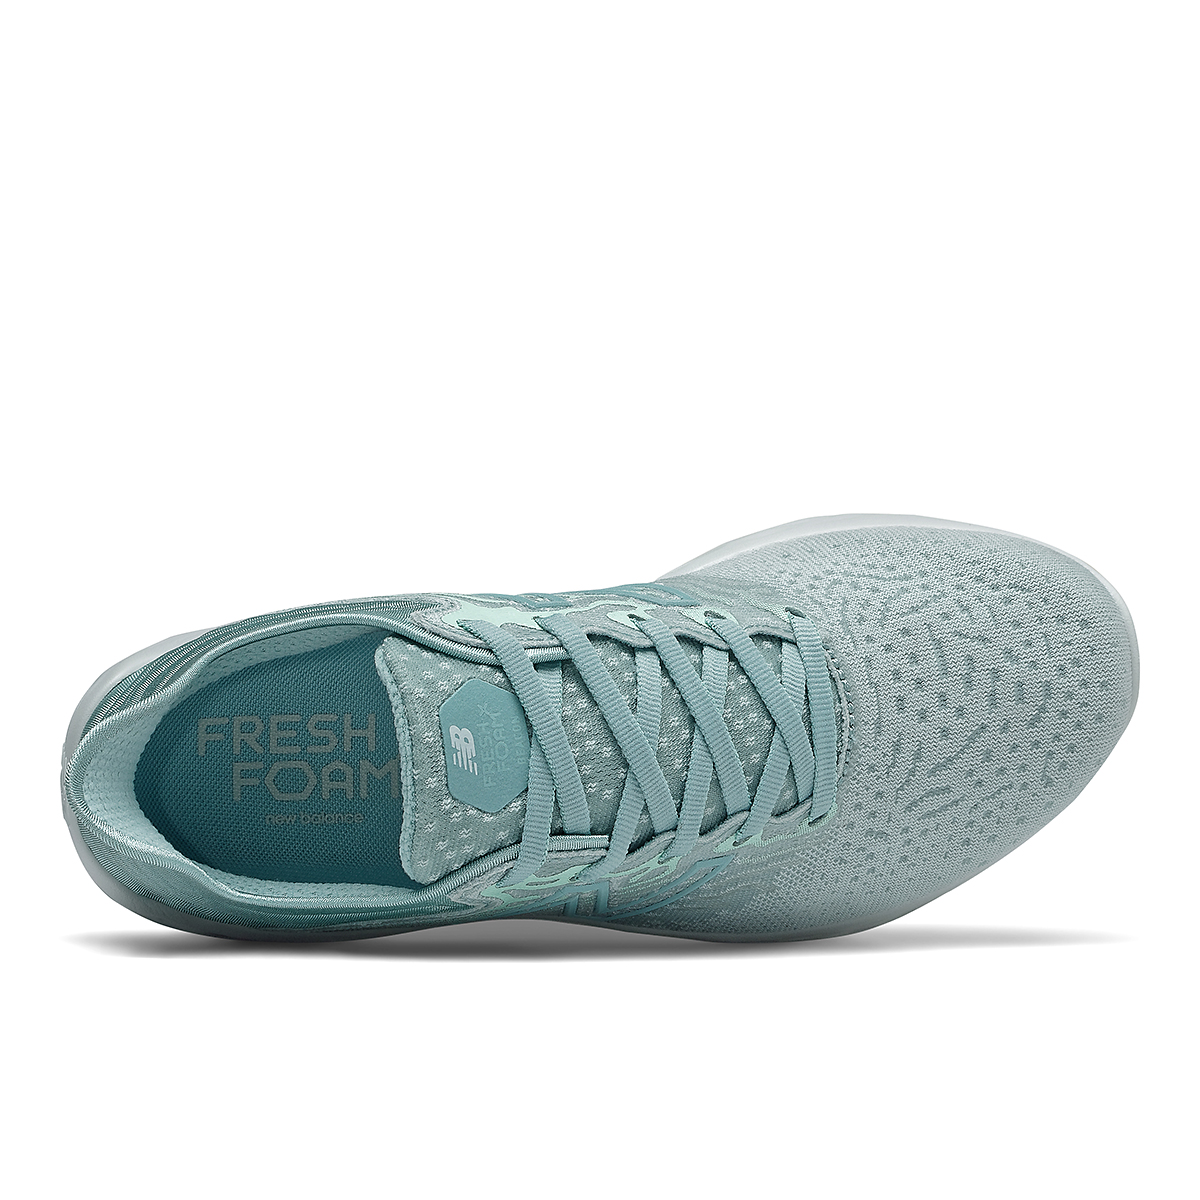 Women's New Balance Beacon V3 Running Shoe - Color: Storm Blue - Size: 5 - Width: Regular, Storm Blue, large, image 3